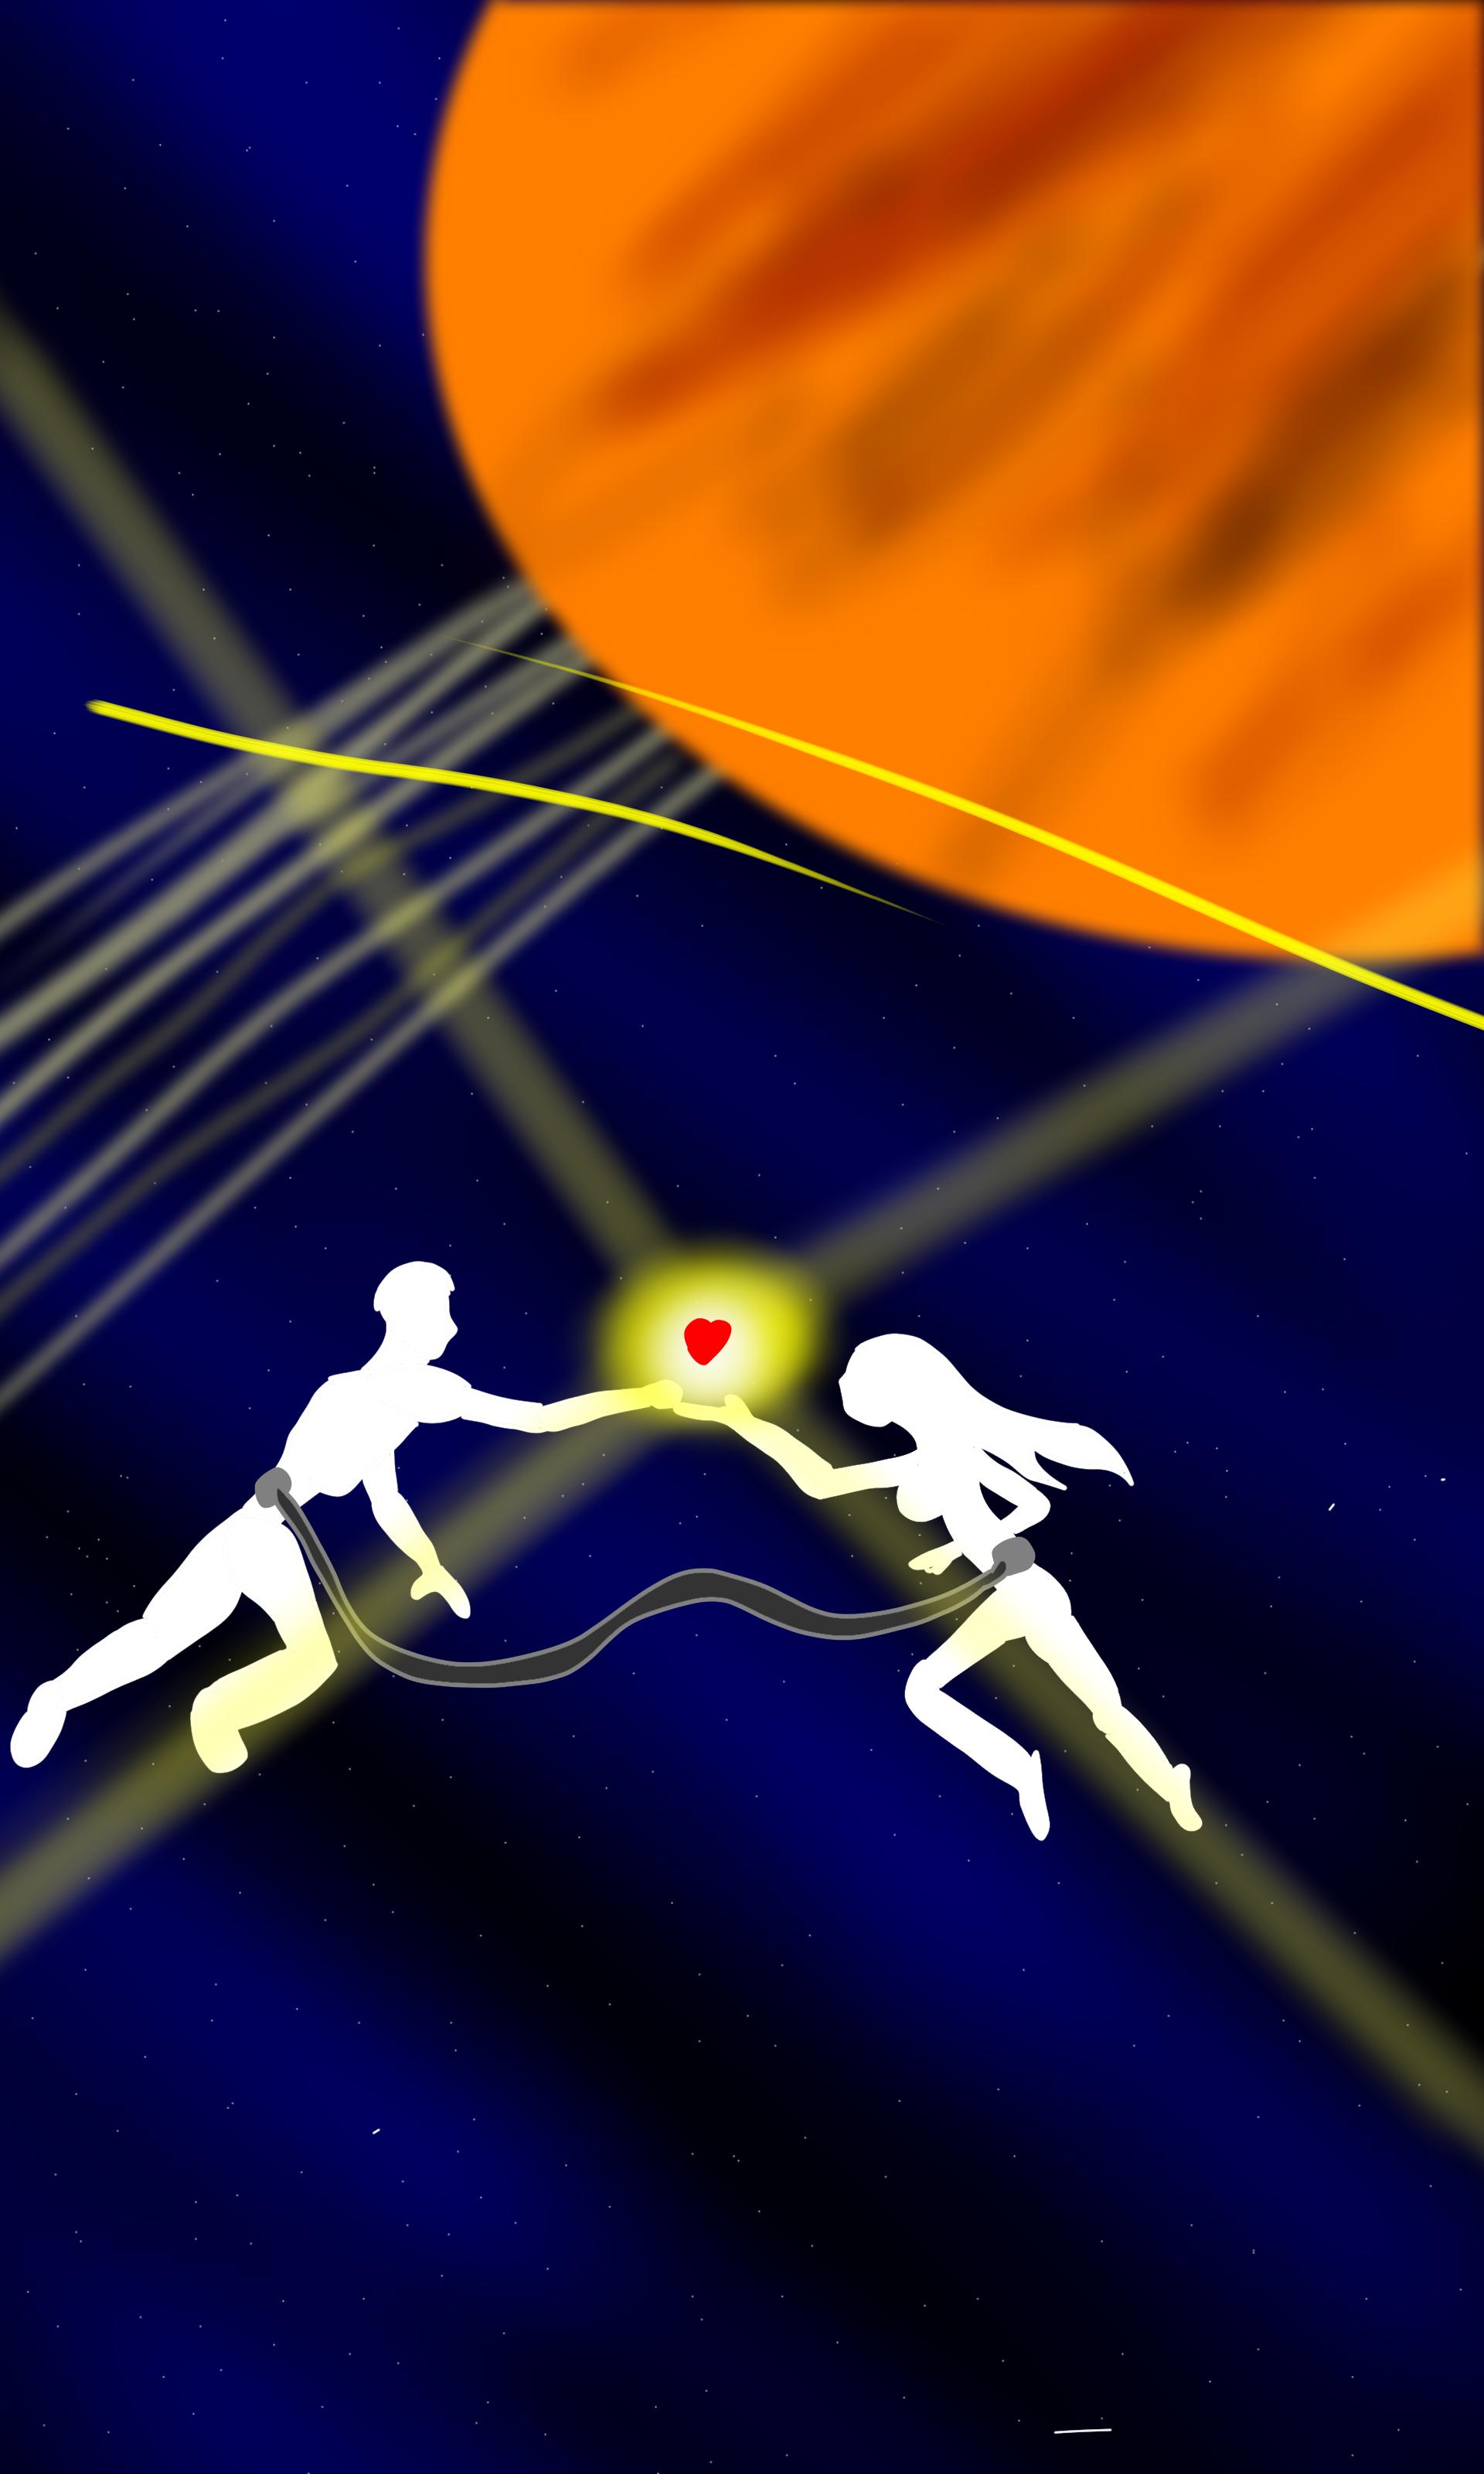 Cosmic Love by MethusulaComics